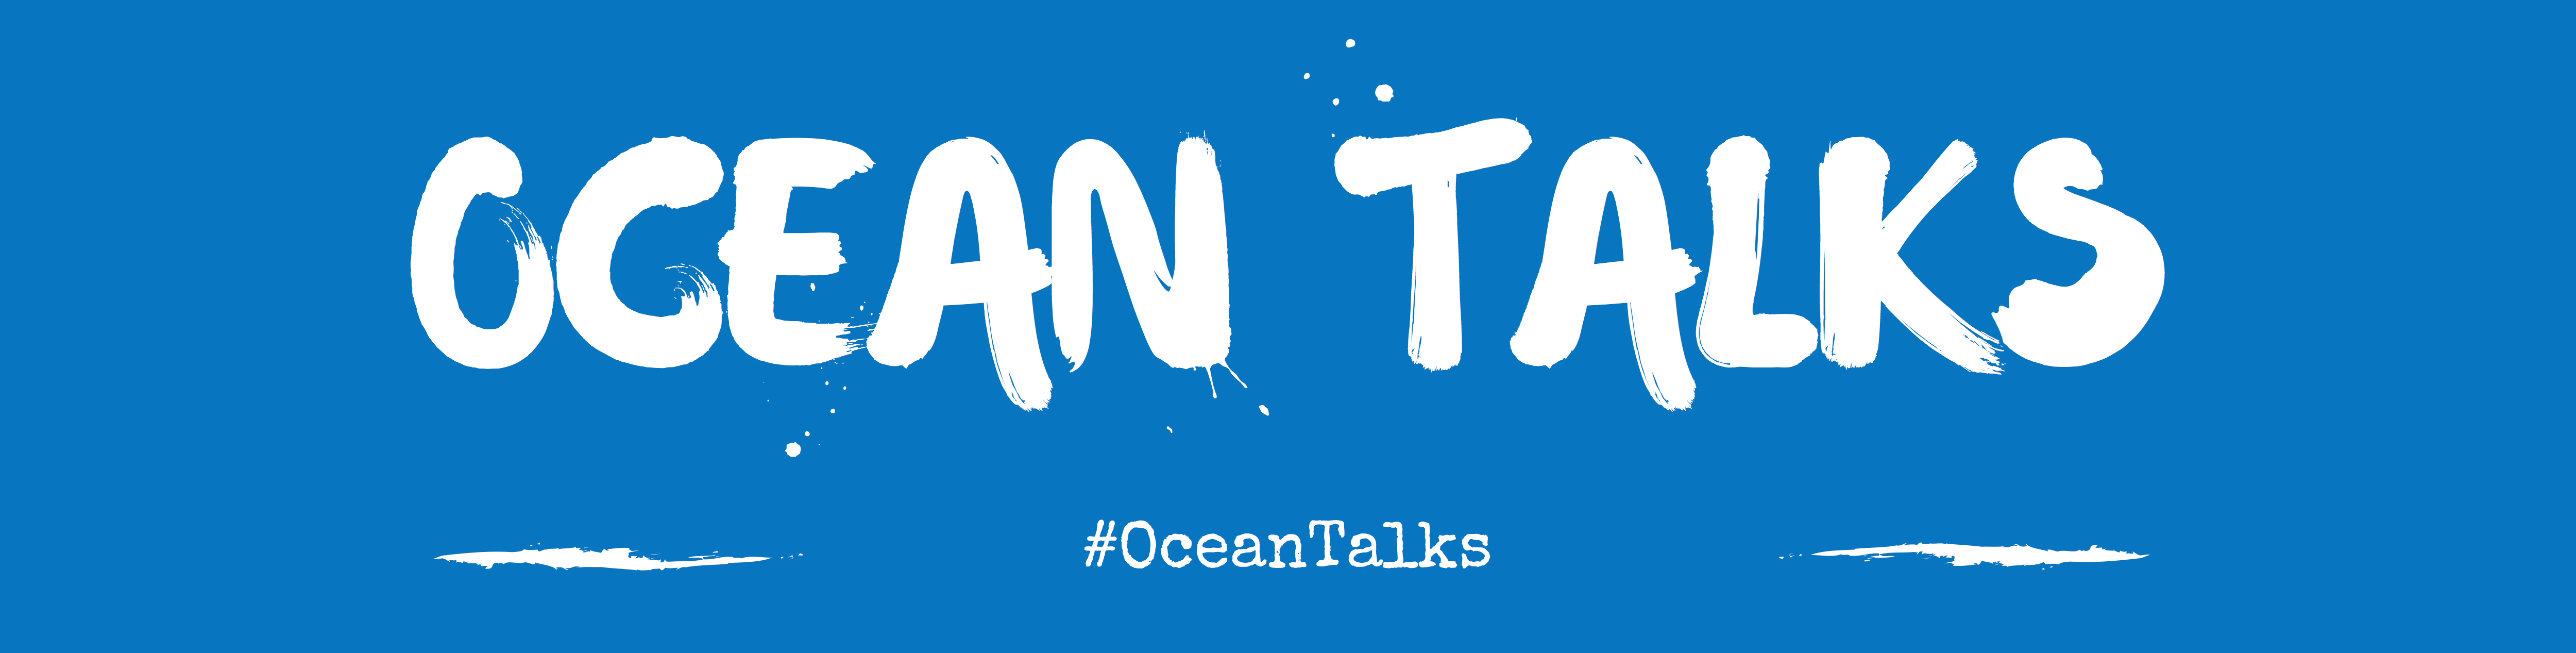 Ocean Talks Text cropped_long